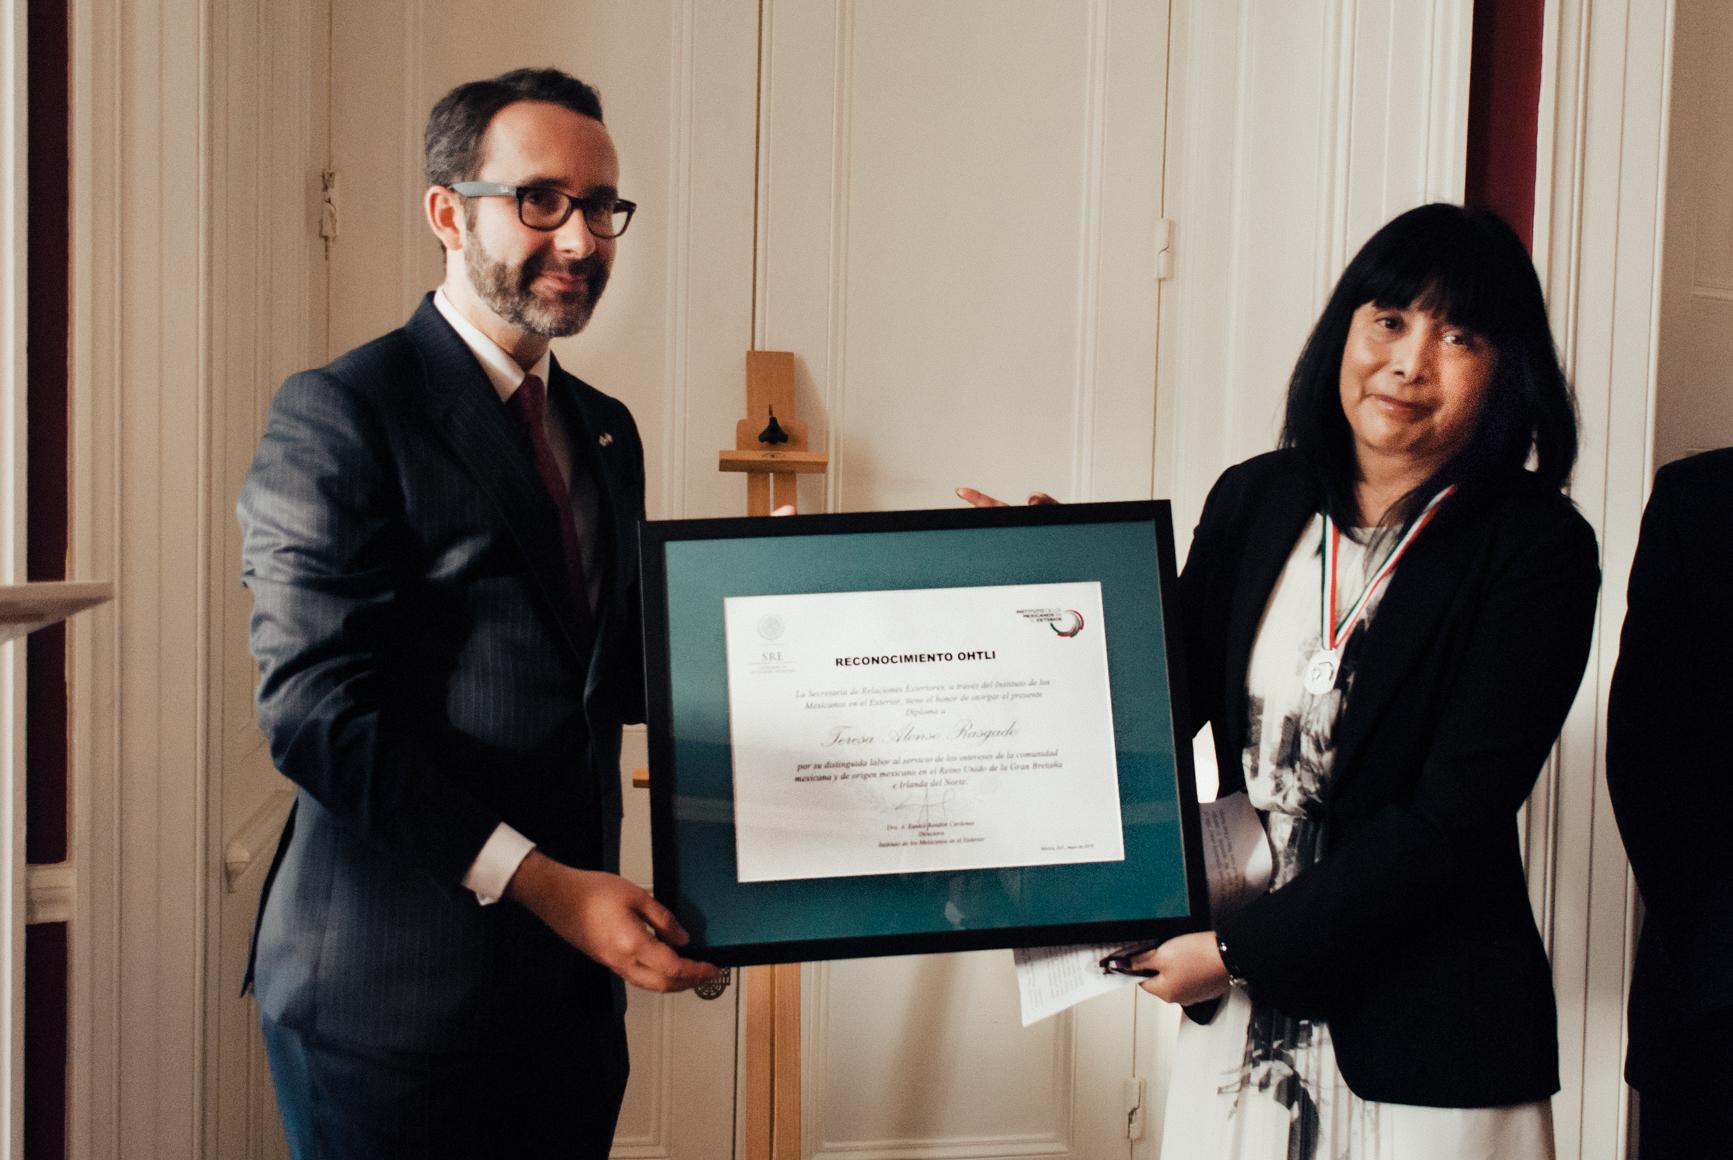 Prof Alonso recibe Premio Ohtli